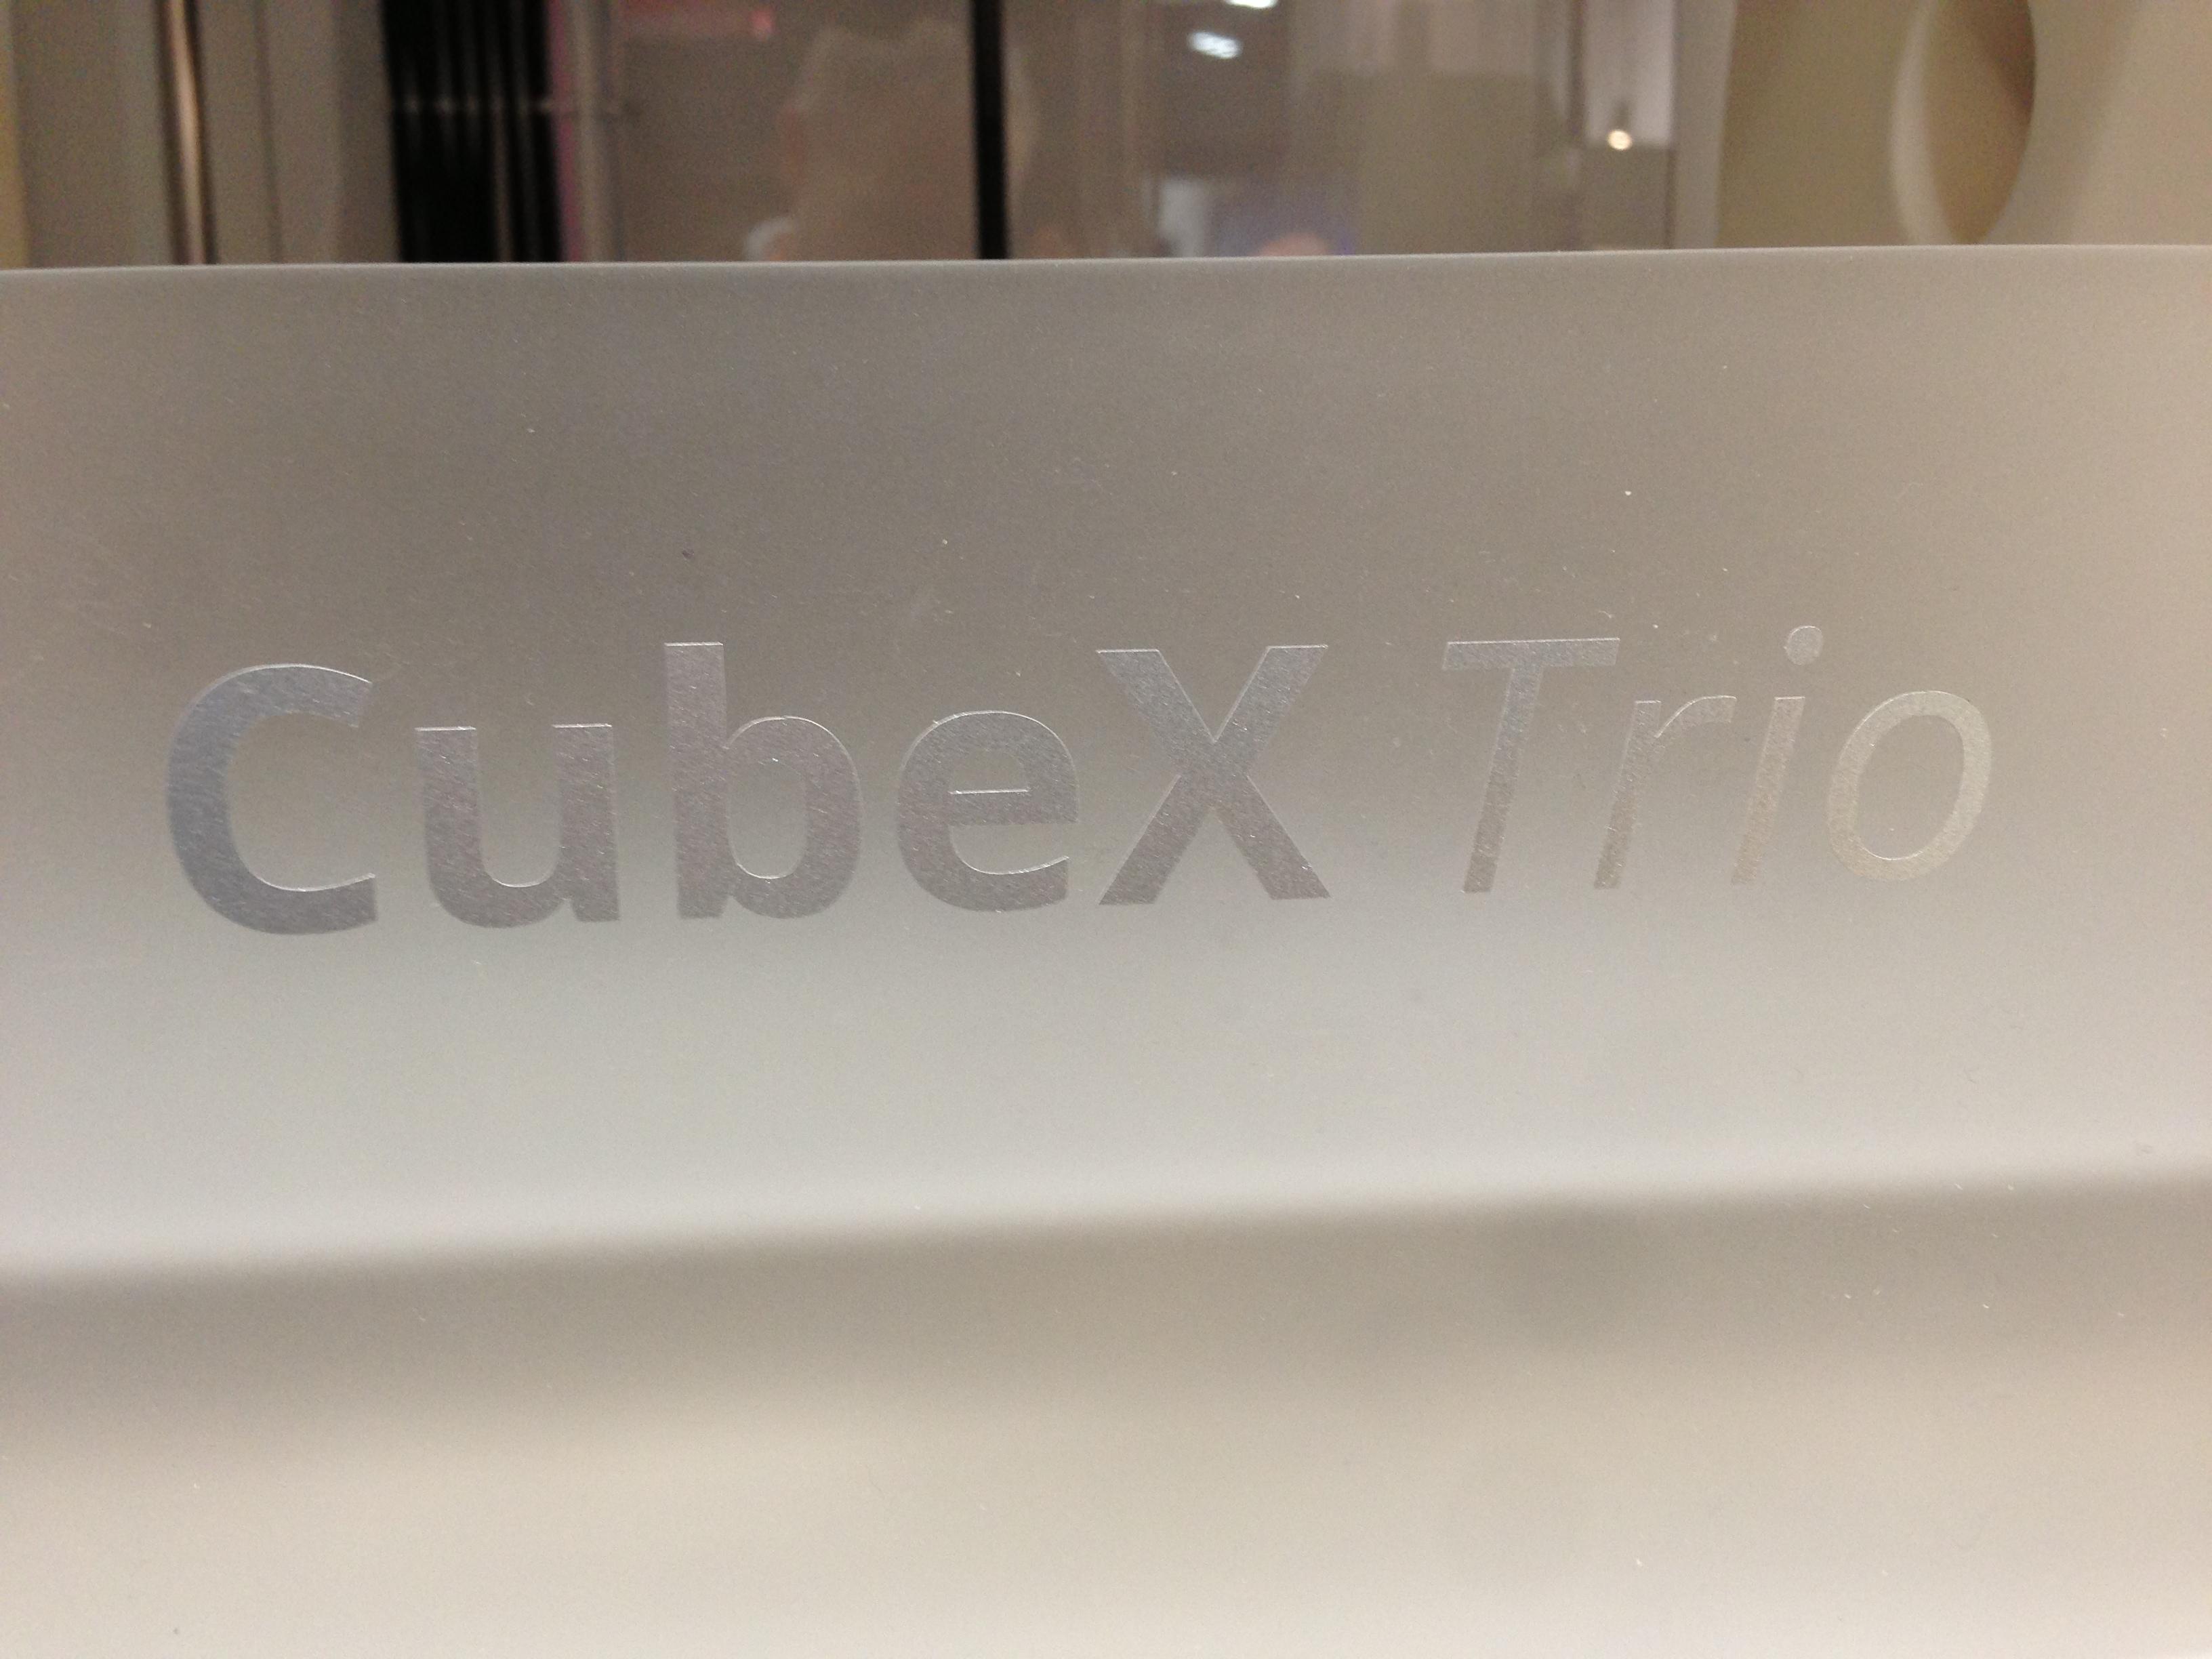 A Bit More on the CubeX 3D Printer